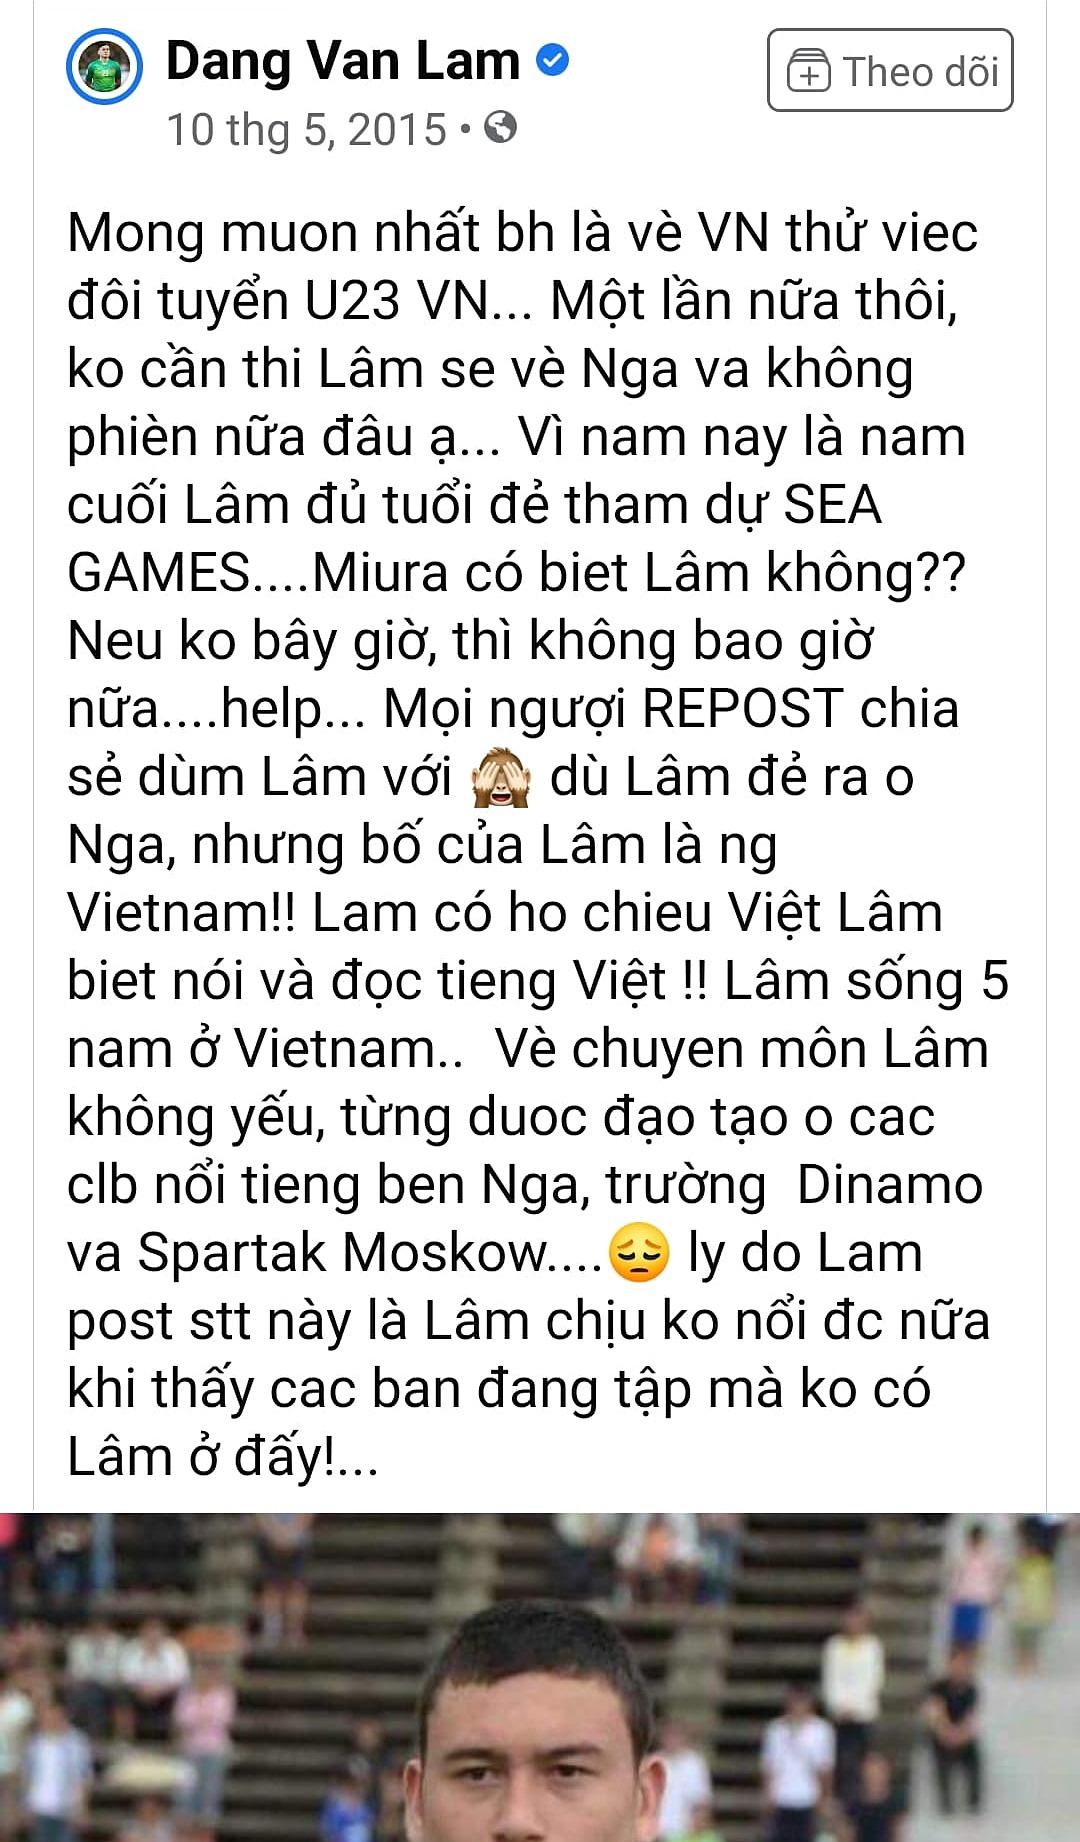 Bagikan Dang Van Lam pada 10 Mei 2015, ketika dia adalah penjaga gawang yang kurang dikenal dan tidak dipanggil ke tim U22 di Vietnam.